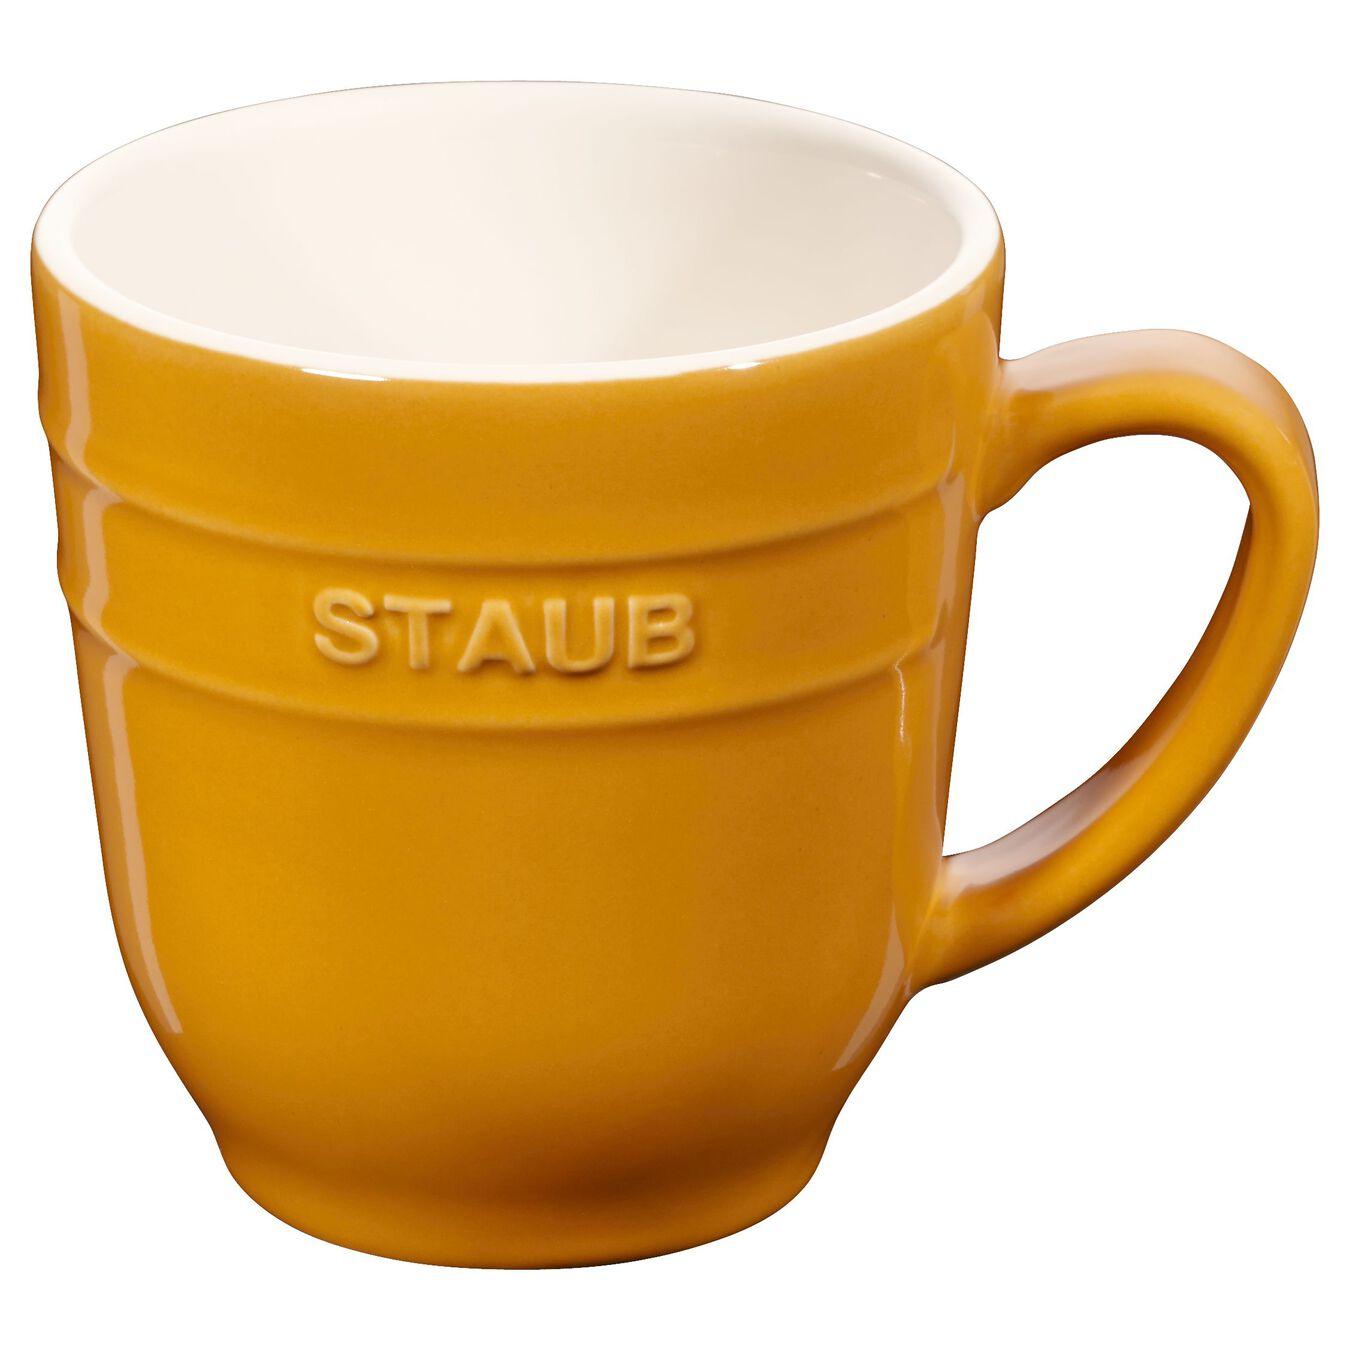 Mug 350 ml, Moutarde, Céramique,,large 1